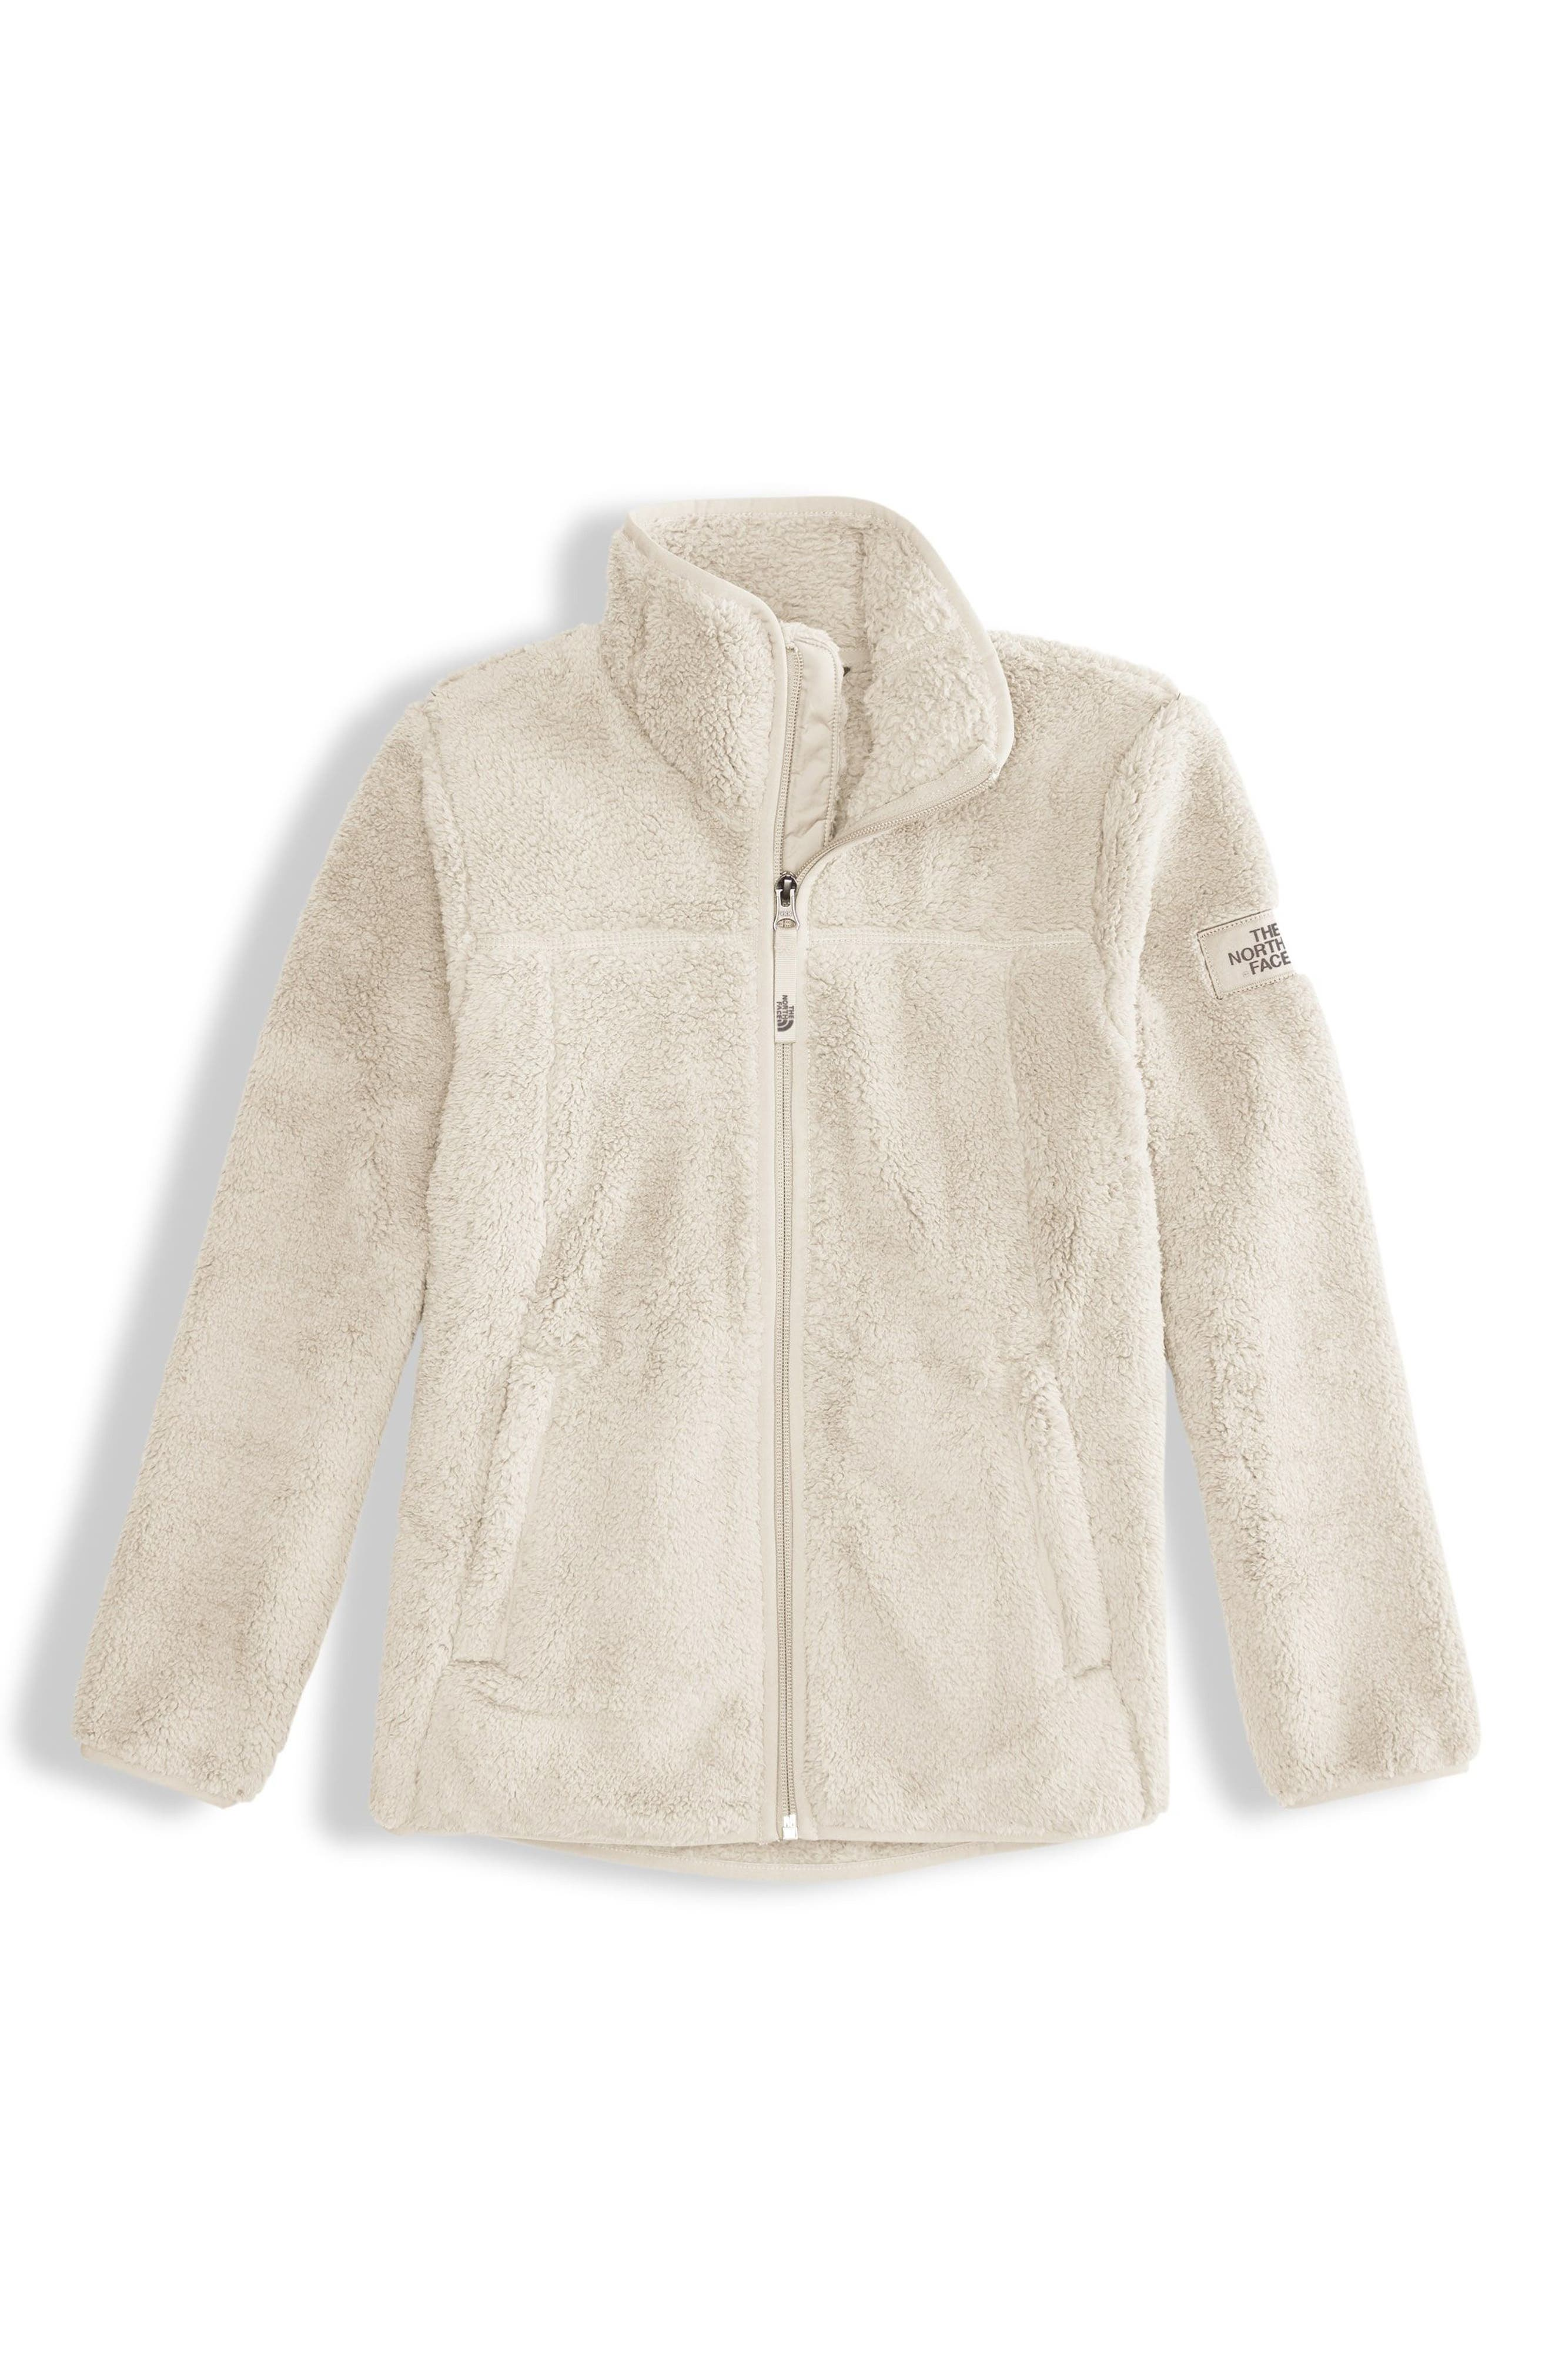 Campshire Fleece Jacket,                             Main thumbnail 1, color,                             VINTAGE WHITE